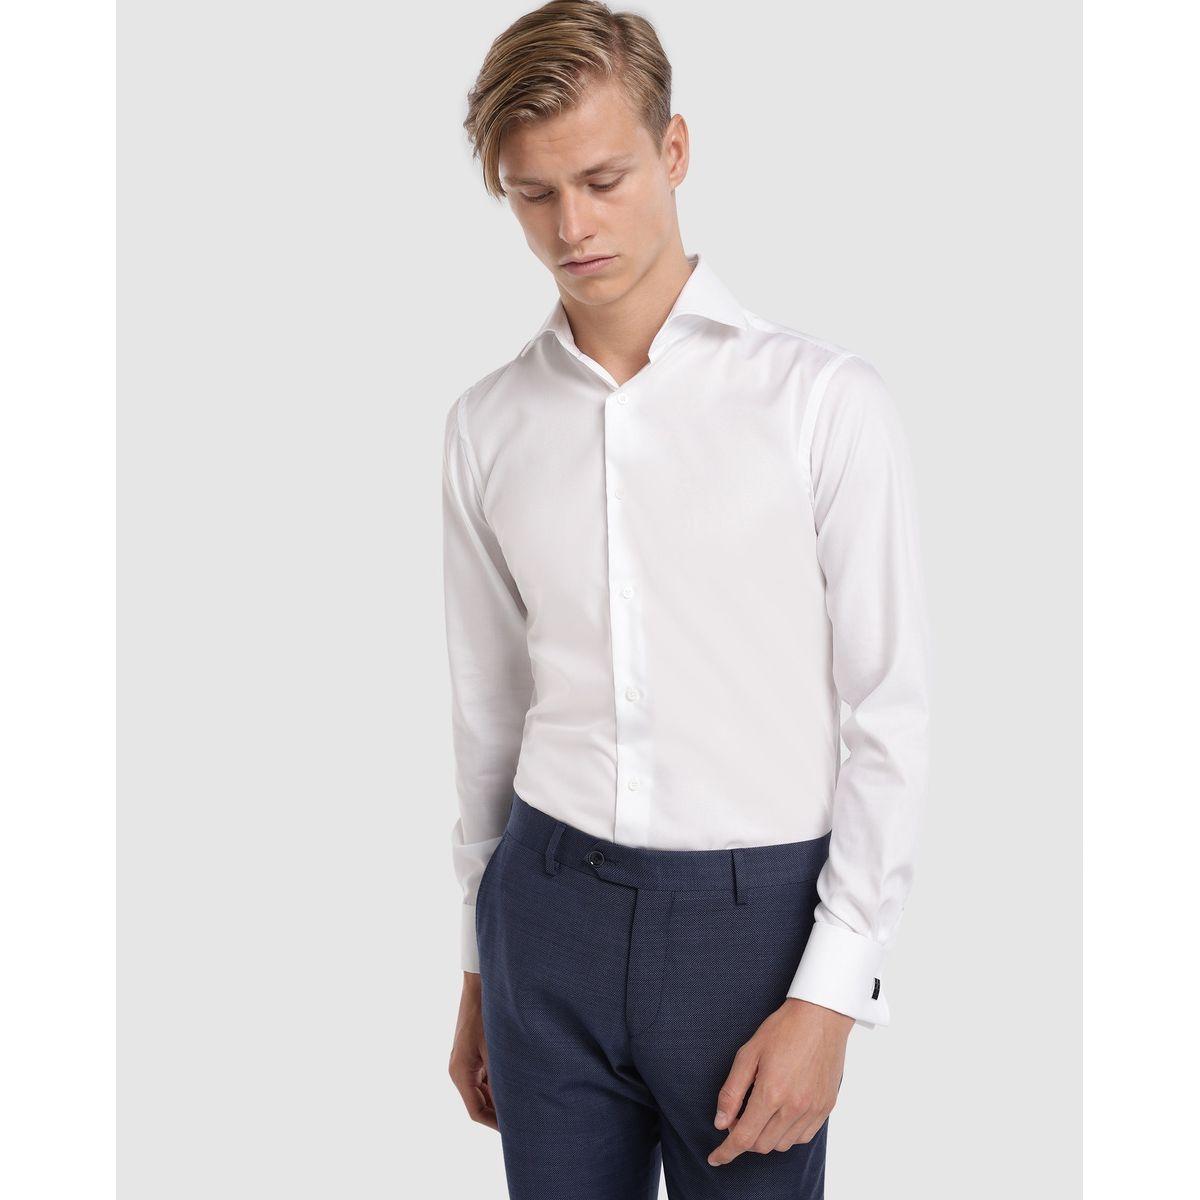 Chemise habillée regular repassage facile unie bleu